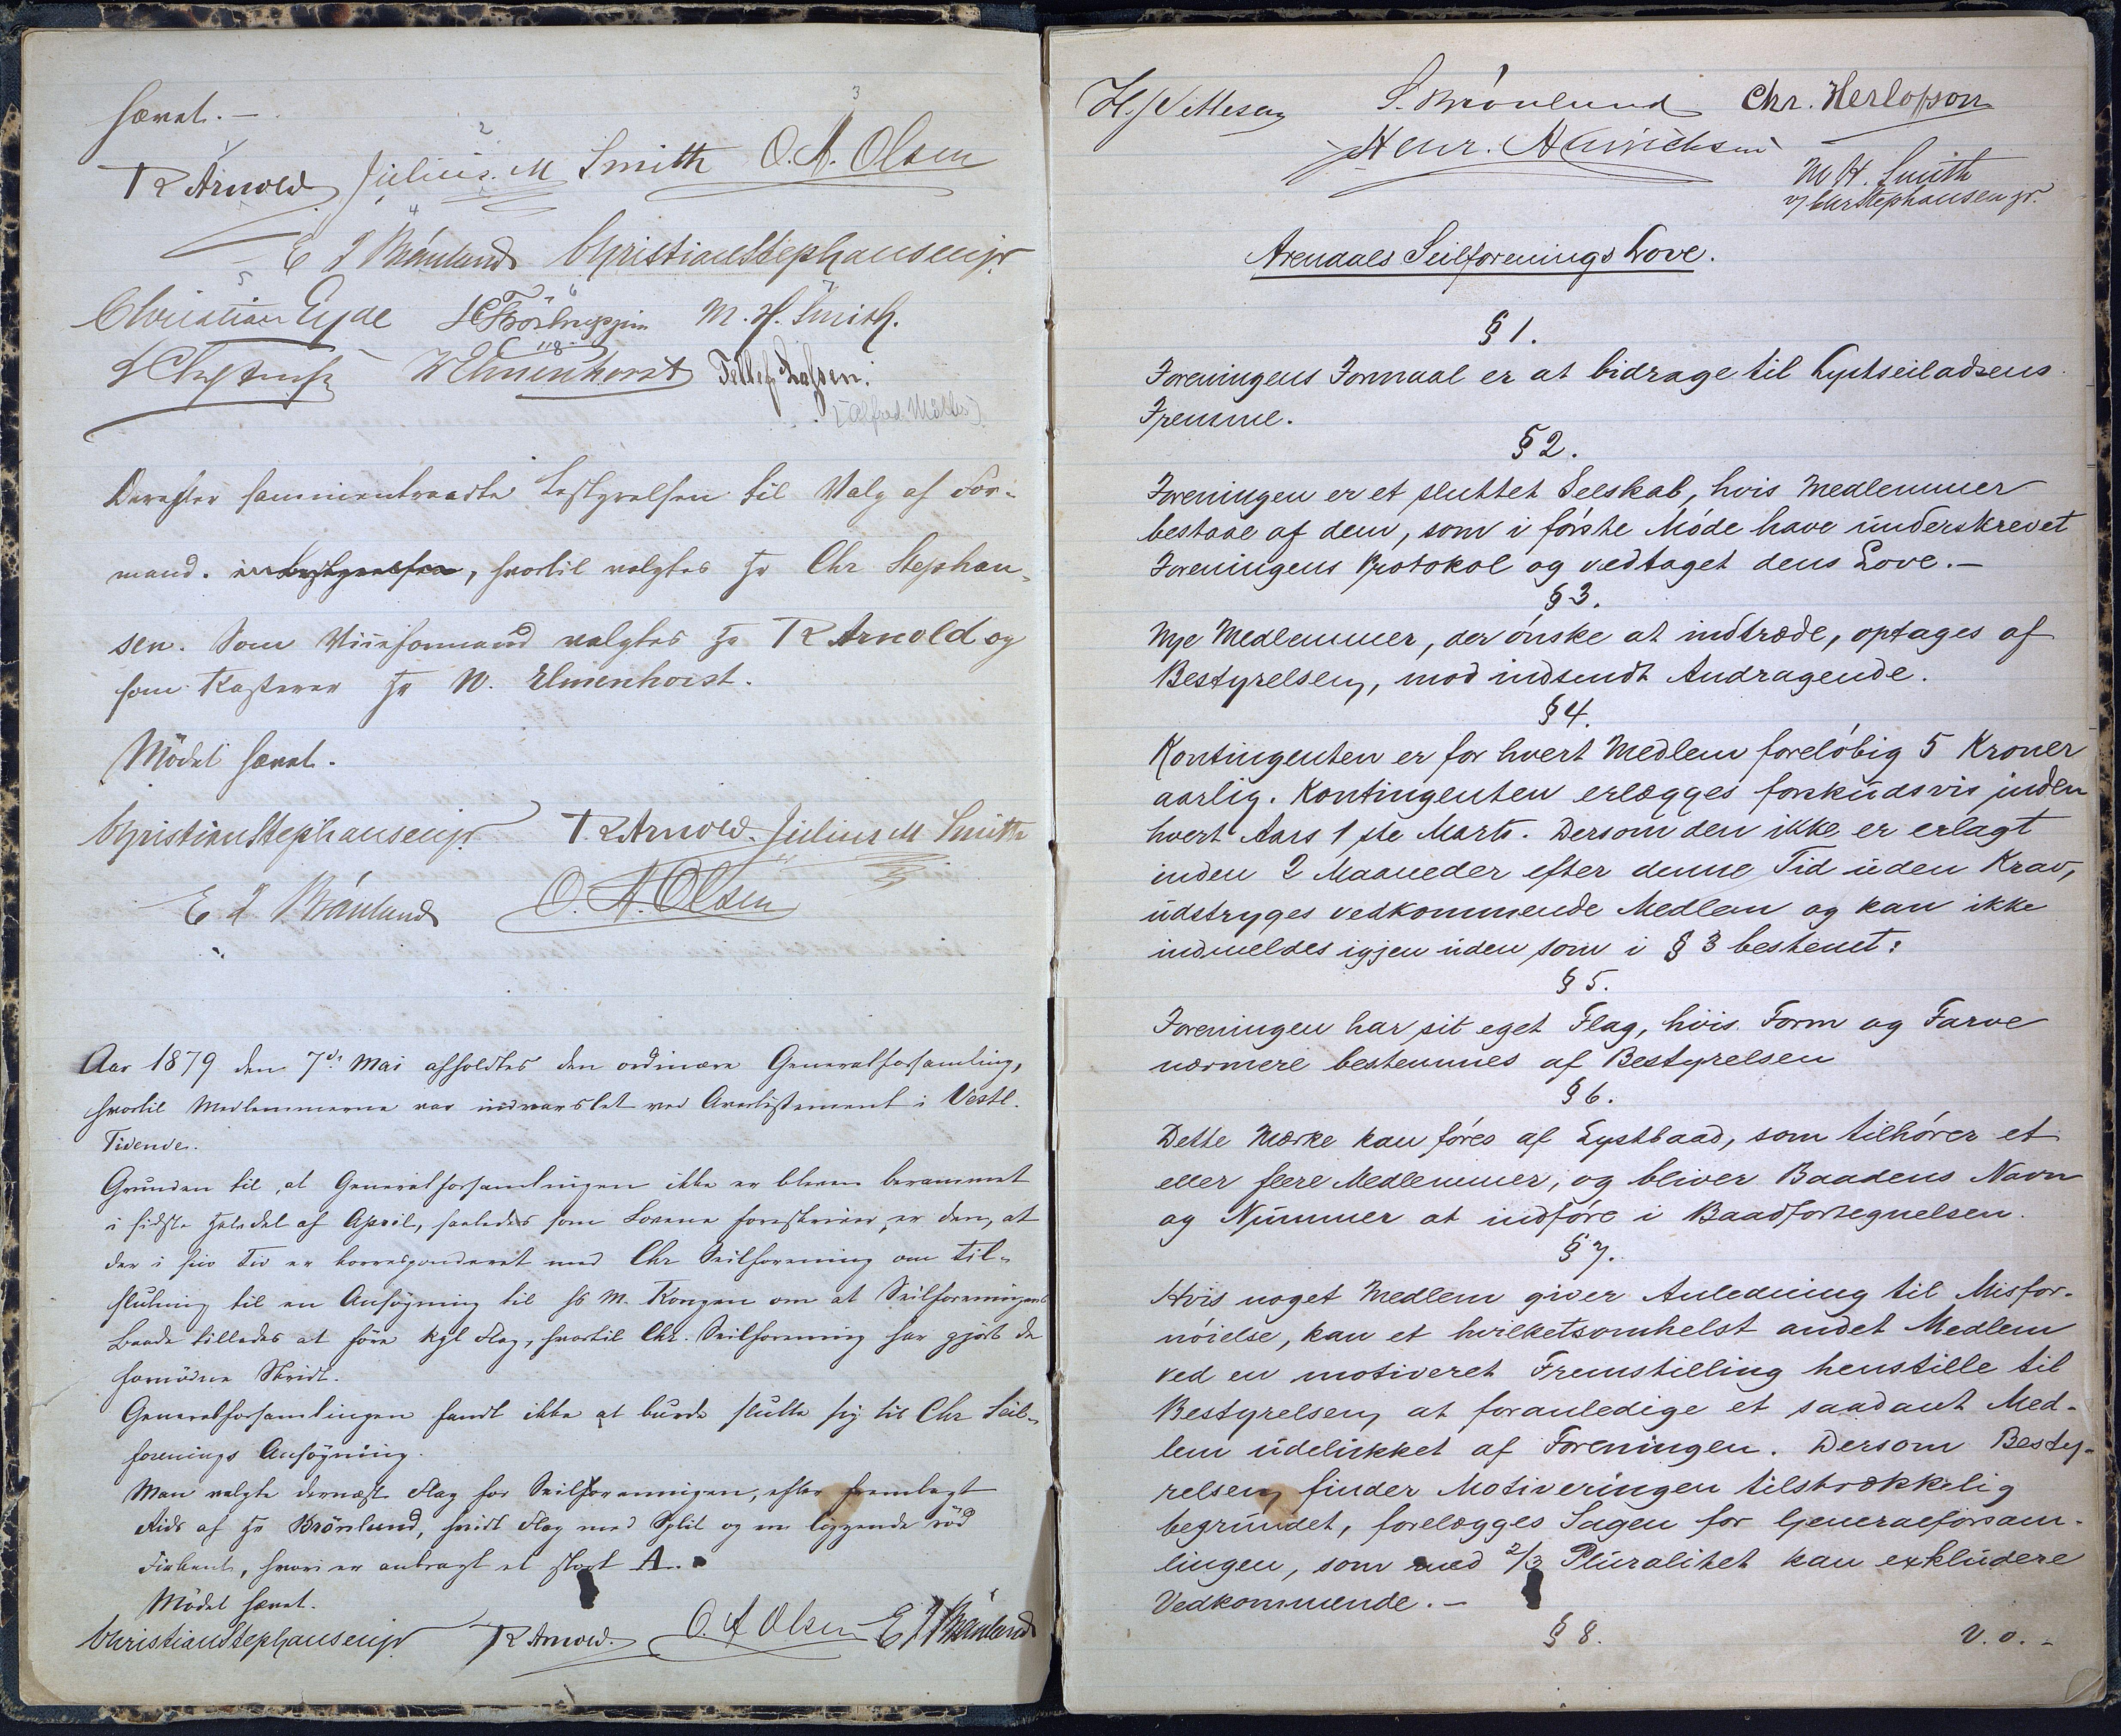 AAKS, Arendal Seilforening, A/A01/L0001: Forhandlingsprotkoll, 1878-1898, s. 2